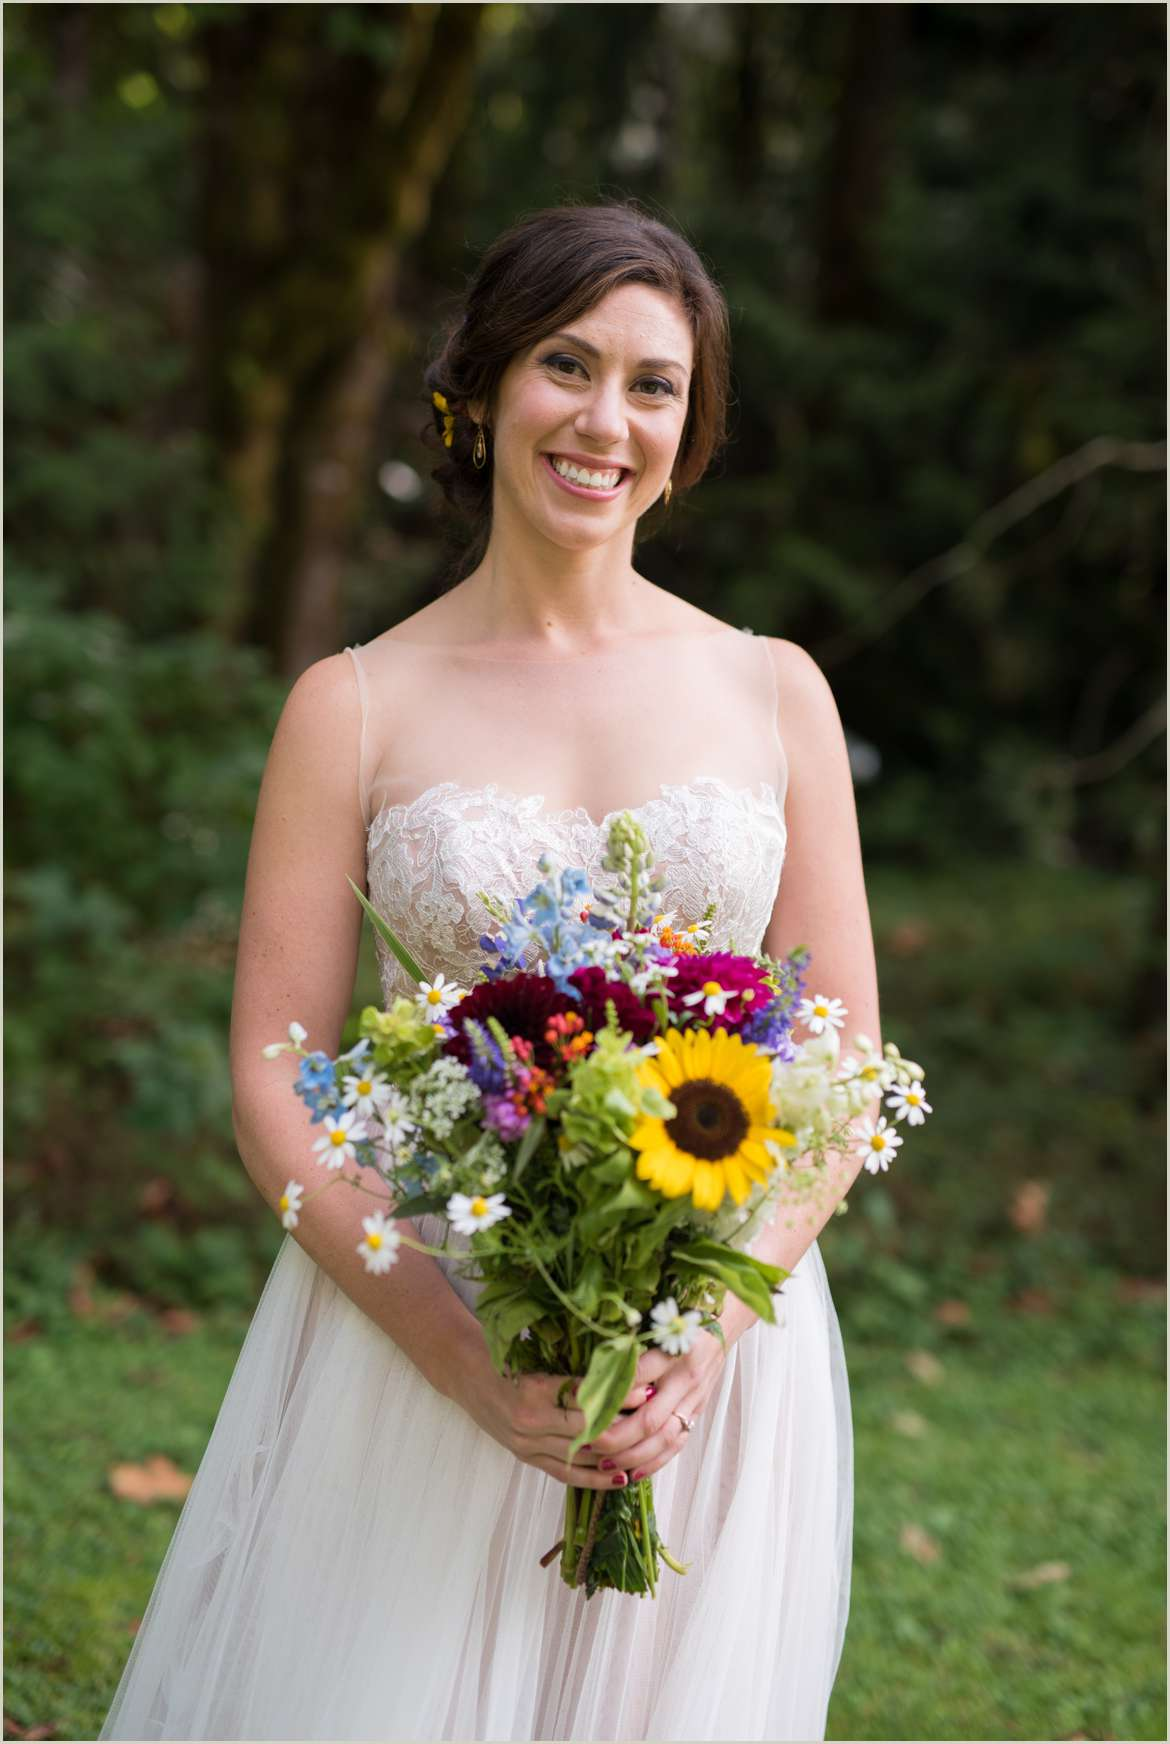 diy wildflower wedding bouquet for outdoor wedding